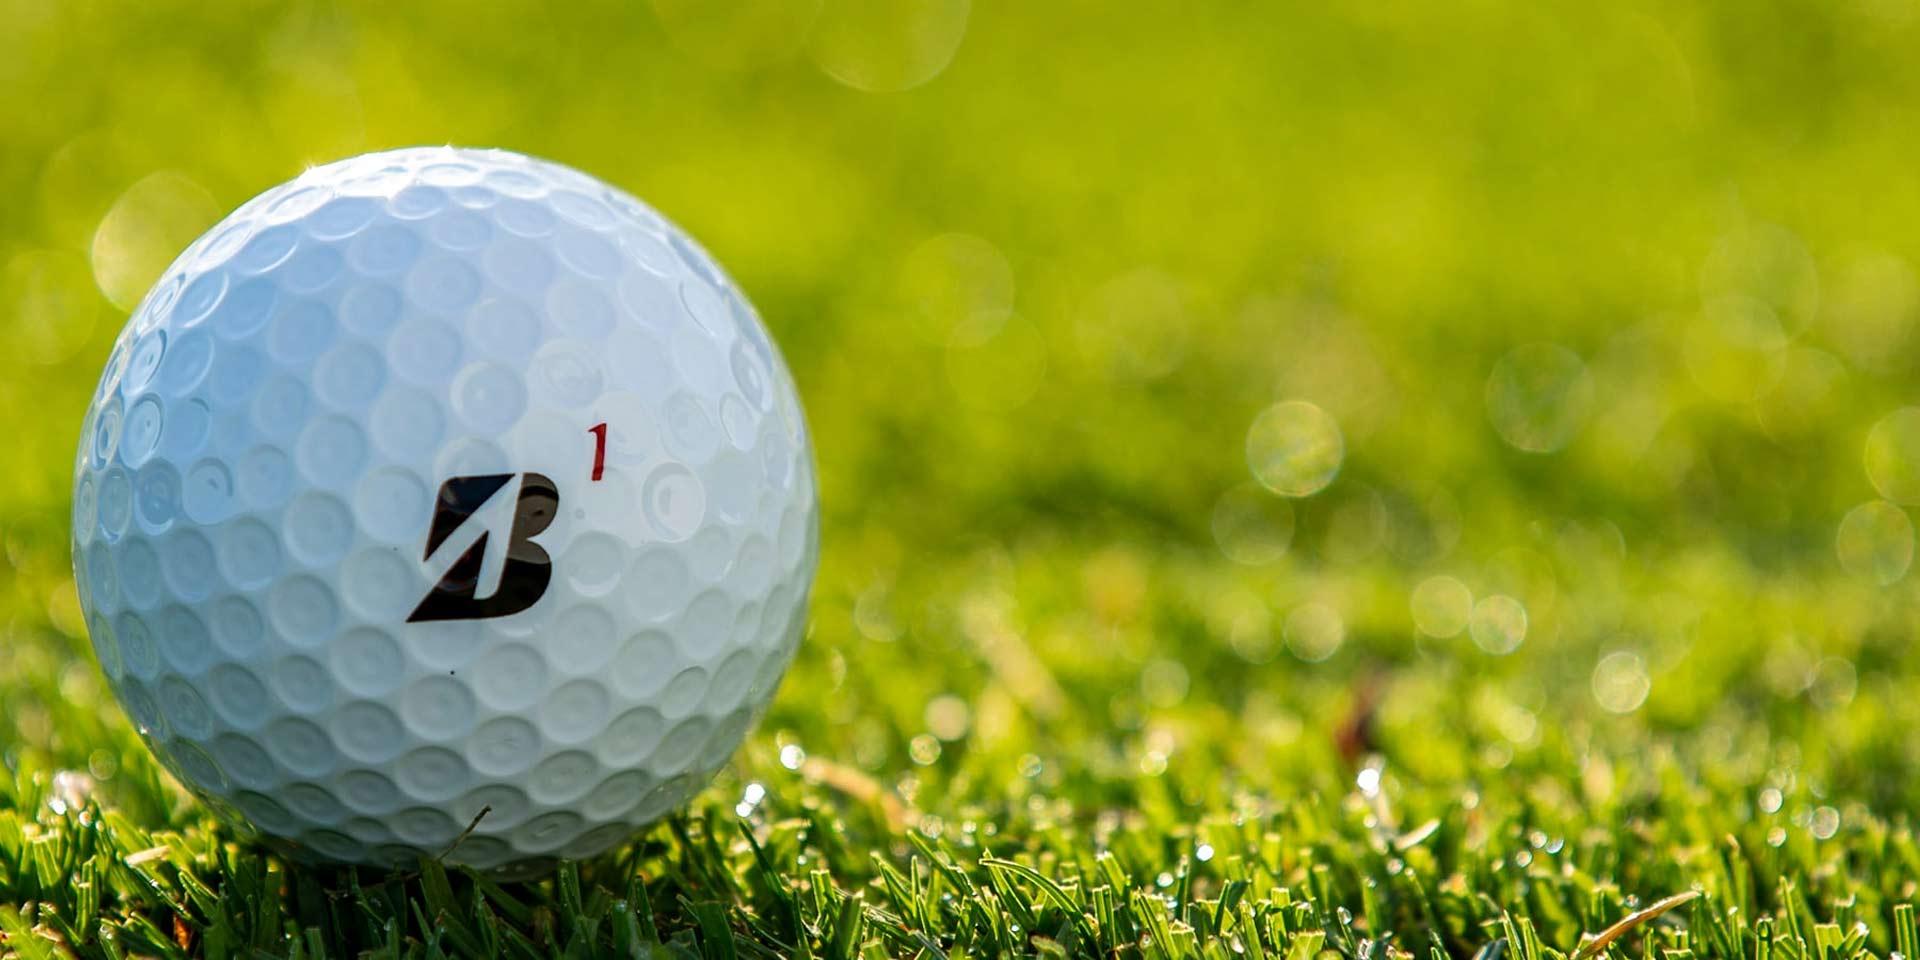 Premium Golf balls versus Budget balls?